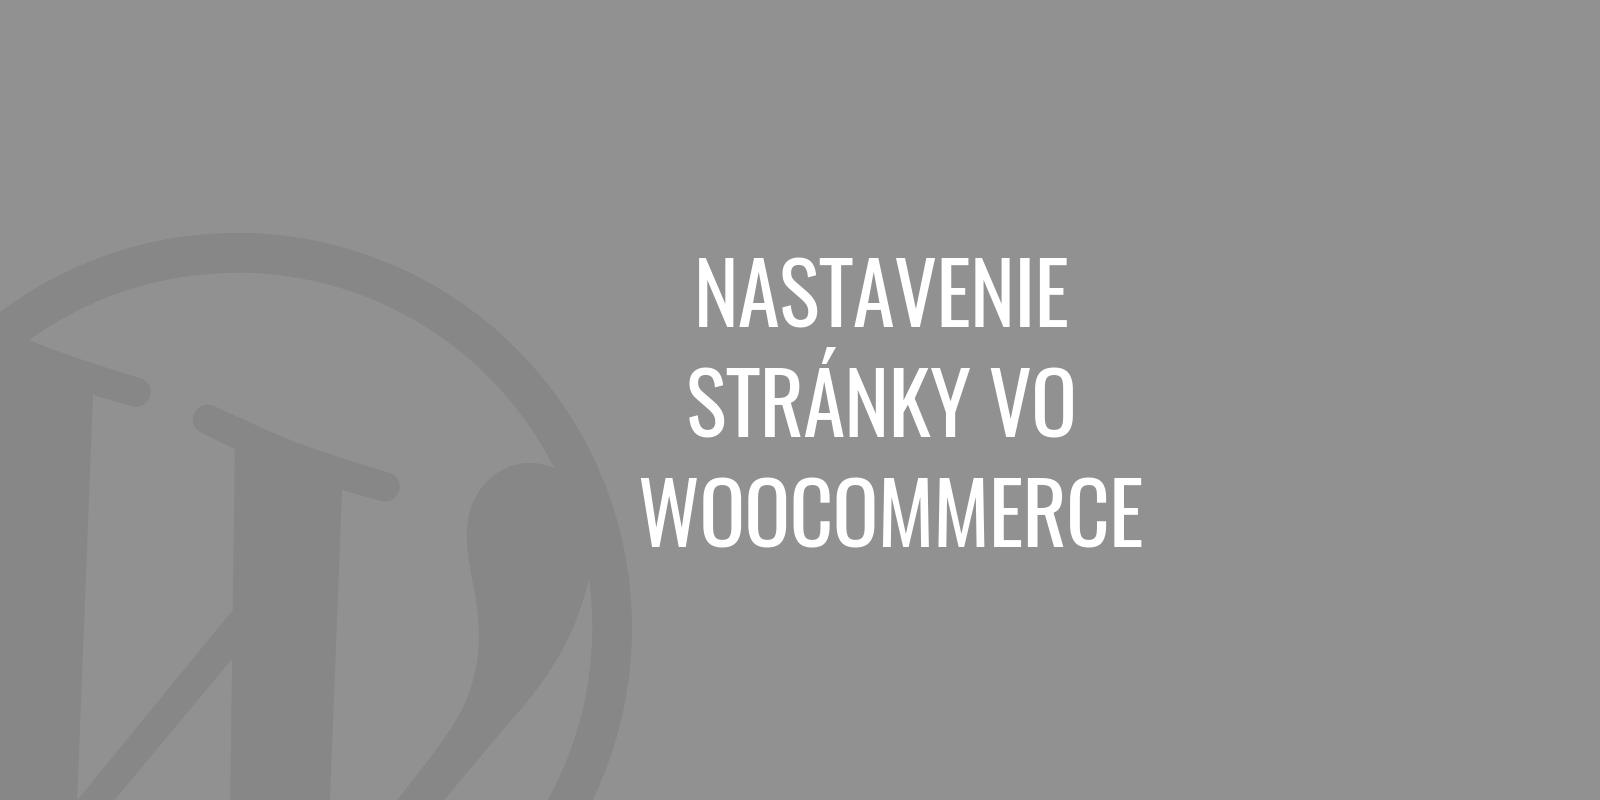 Nastavenie stránky vo WooCommerce